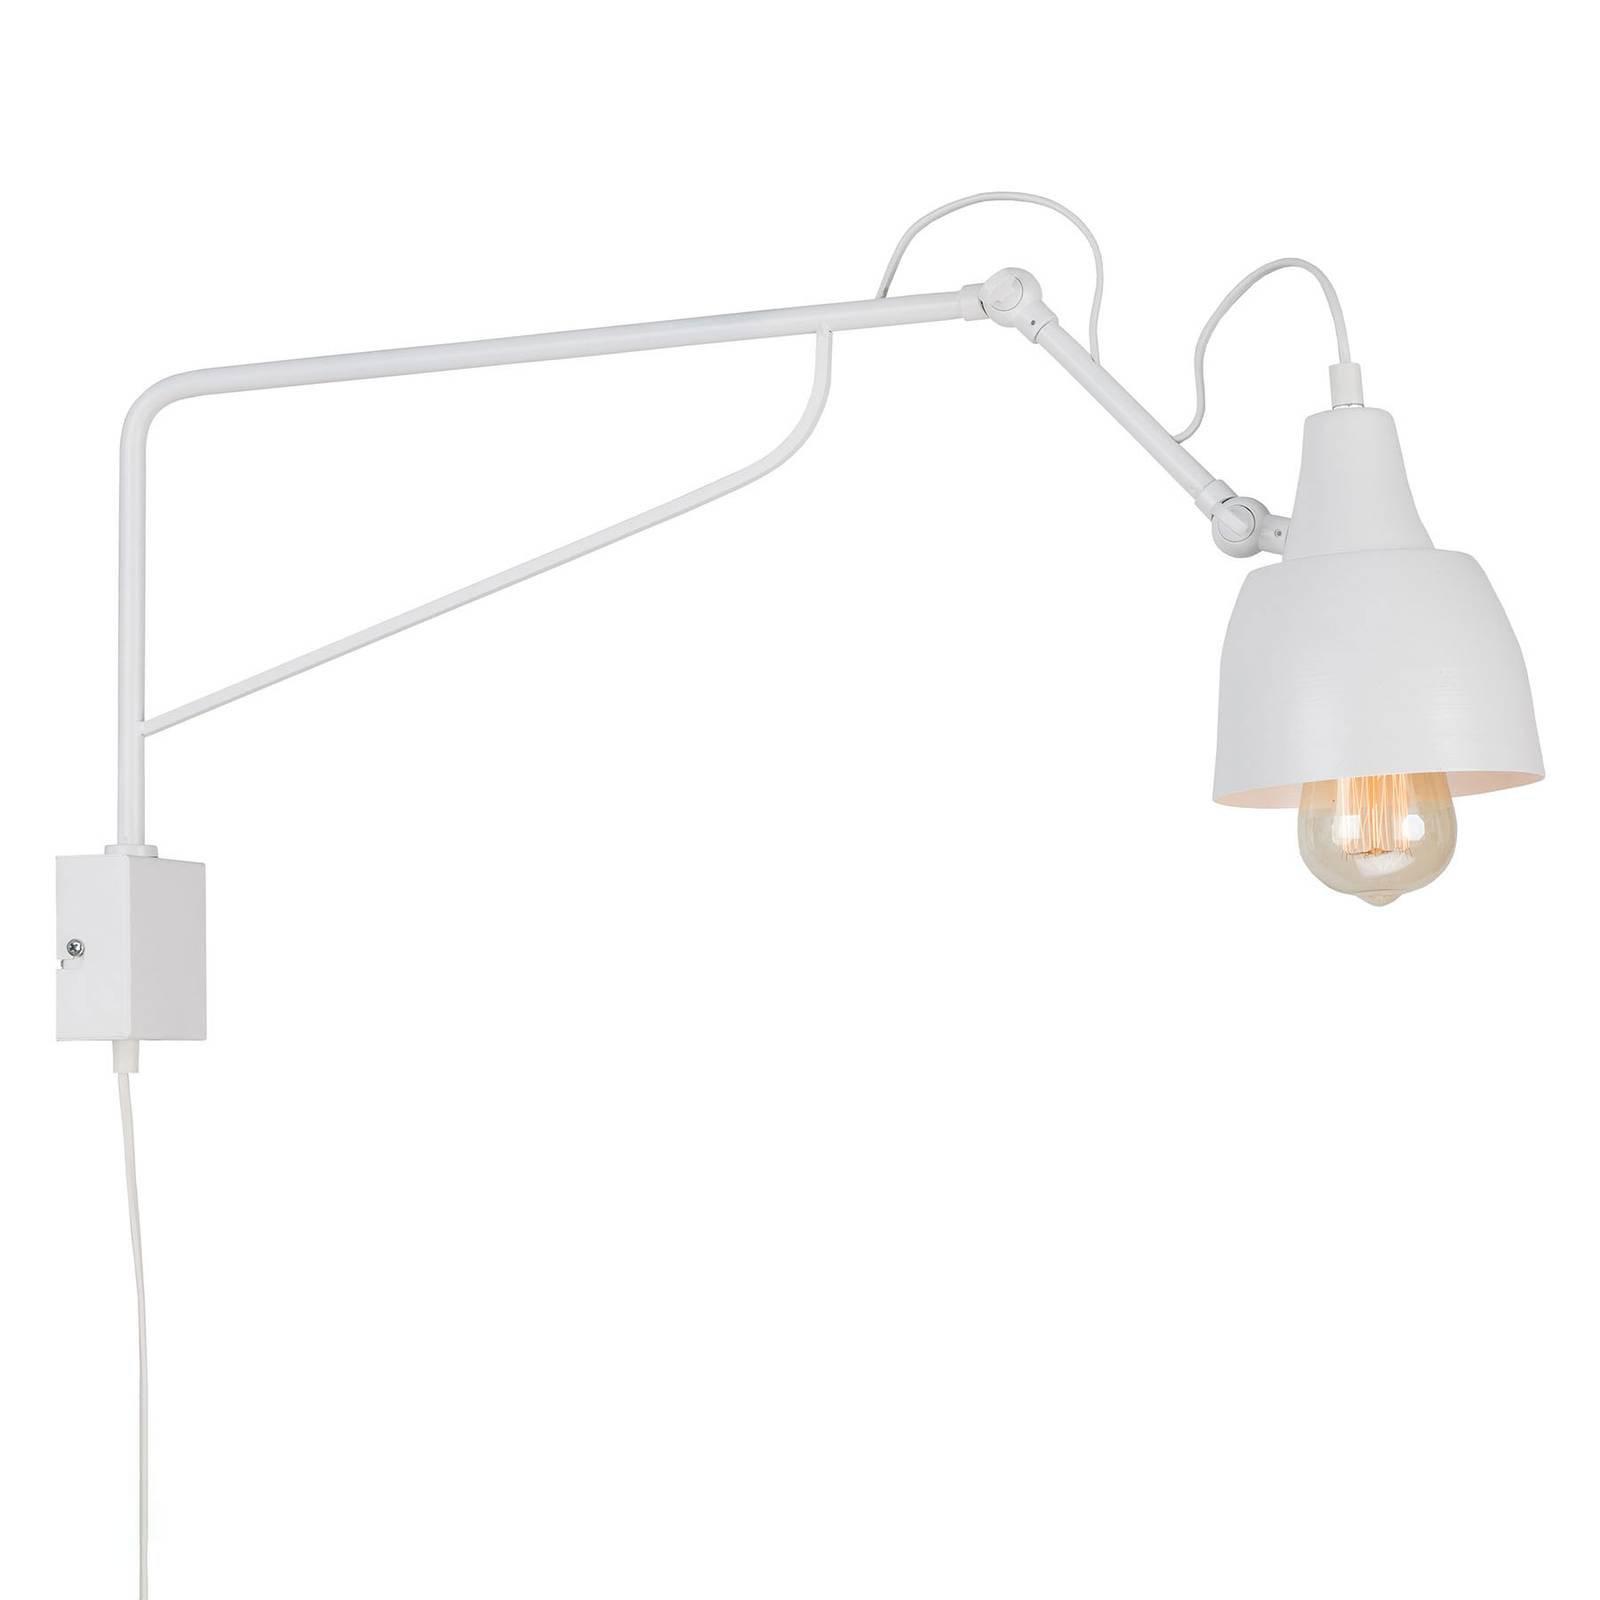 1002 vegglampe med plugg, 1 lyskilde, hvit